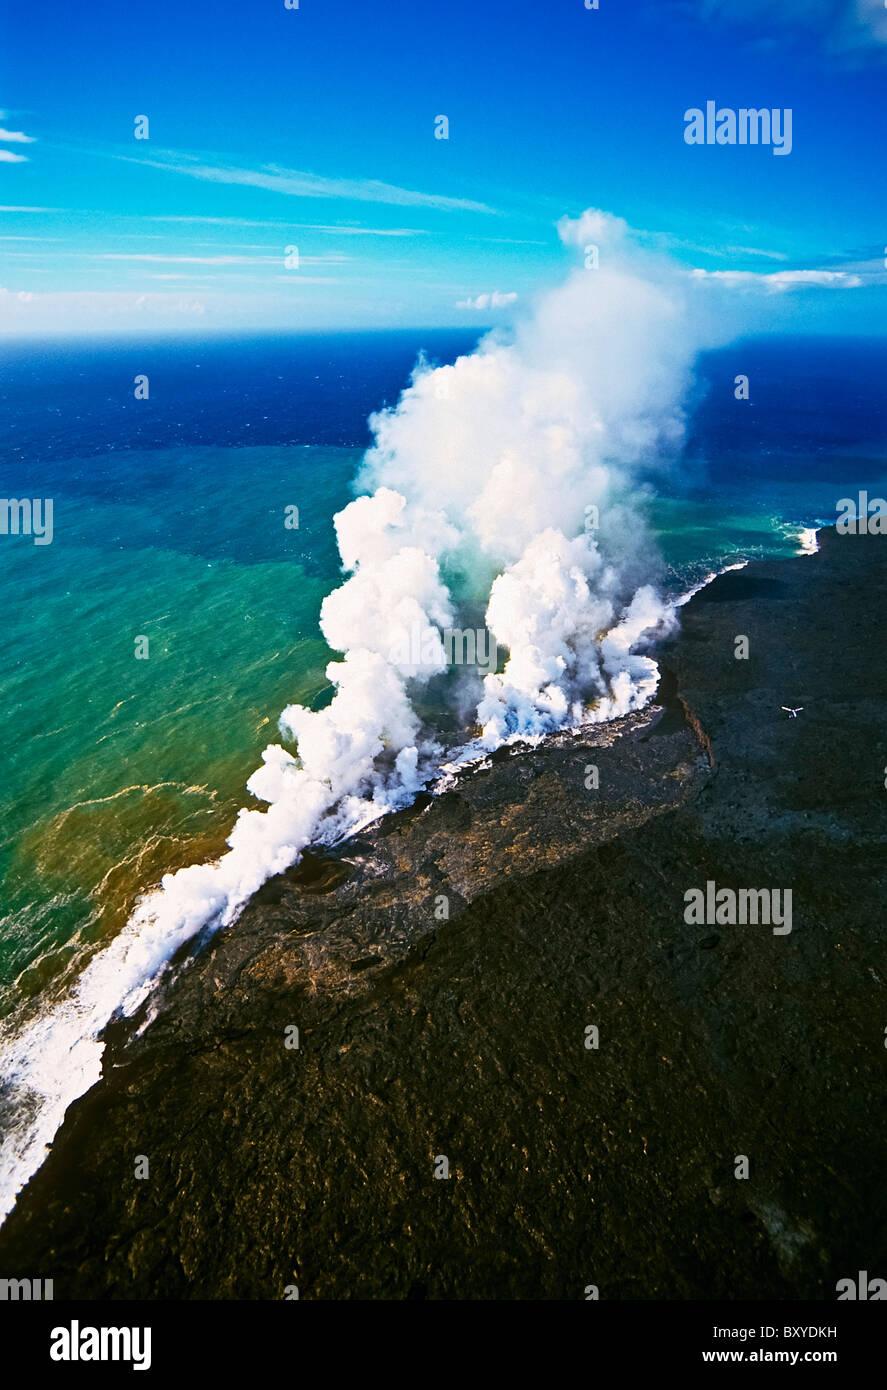 Molten Lava enters cold Ocean, Kilauea Volcano, Big Island, Hawaii, USA - Stock Image